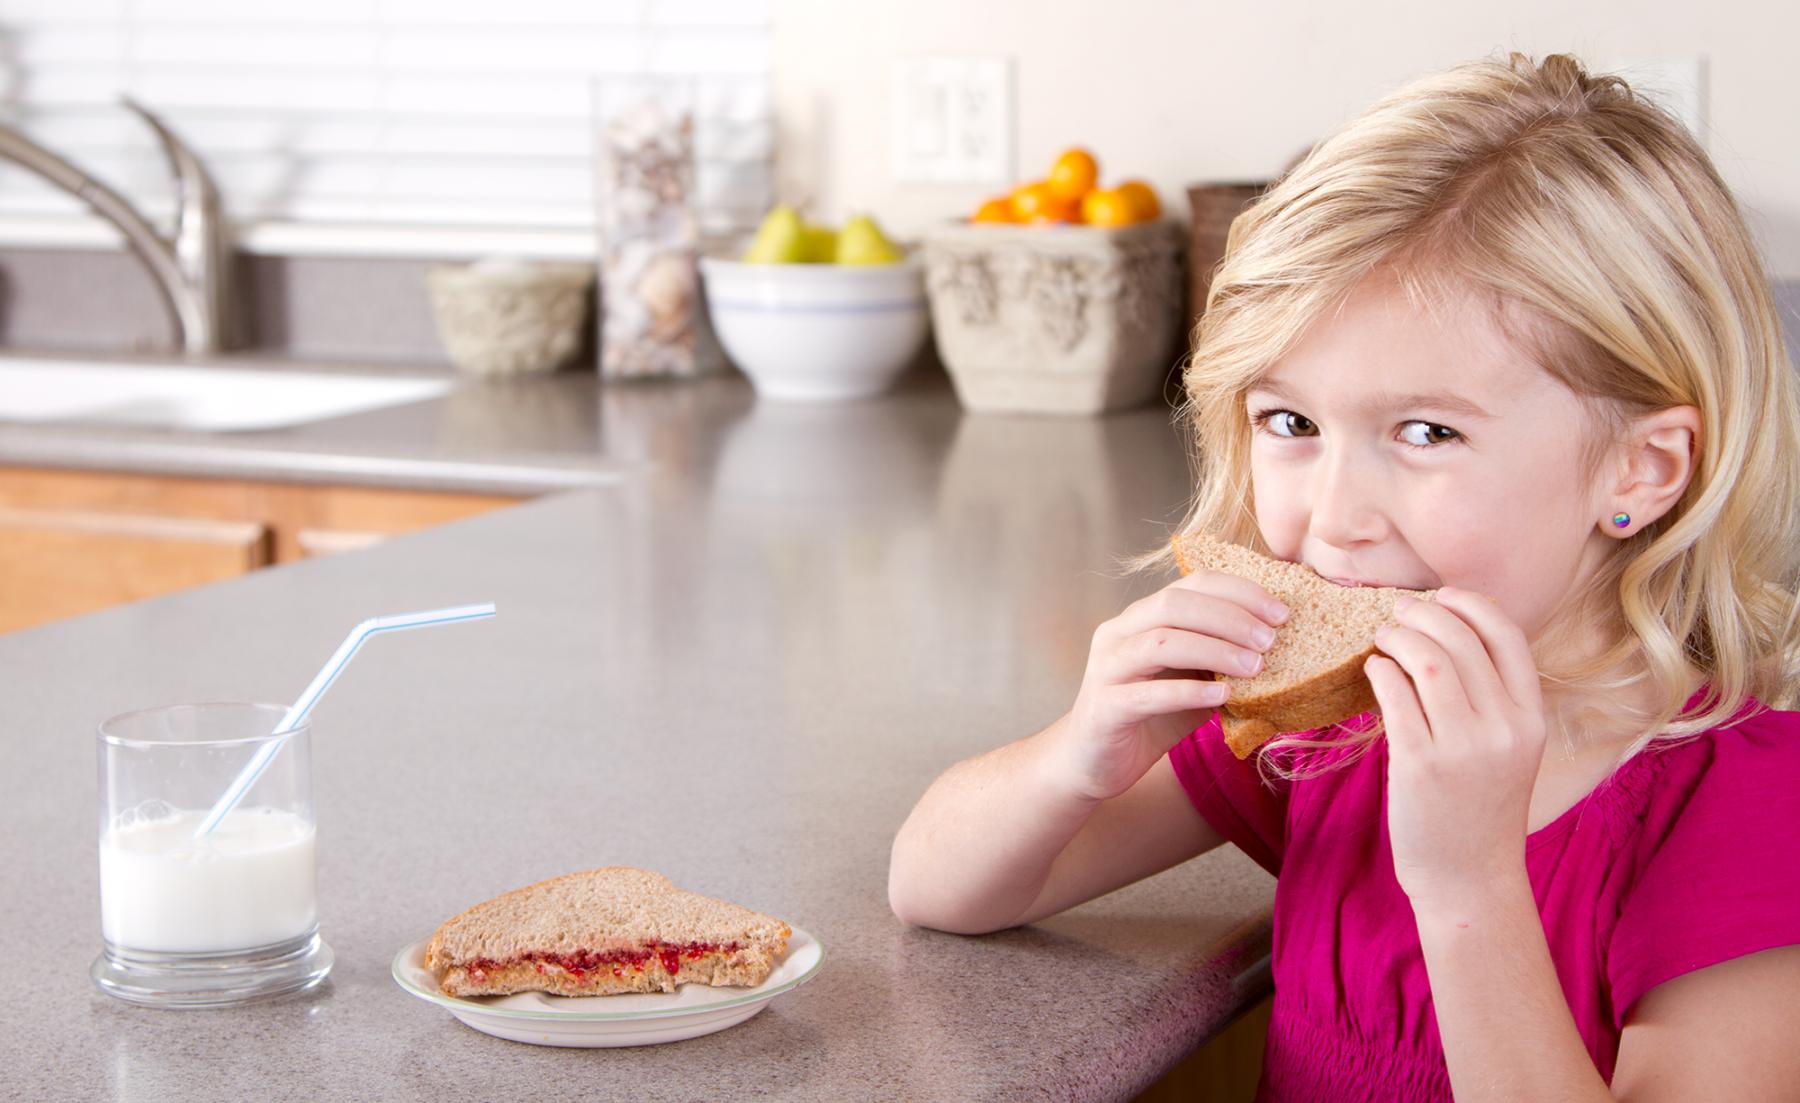 Photo: Girl eating whole grain sandwich.